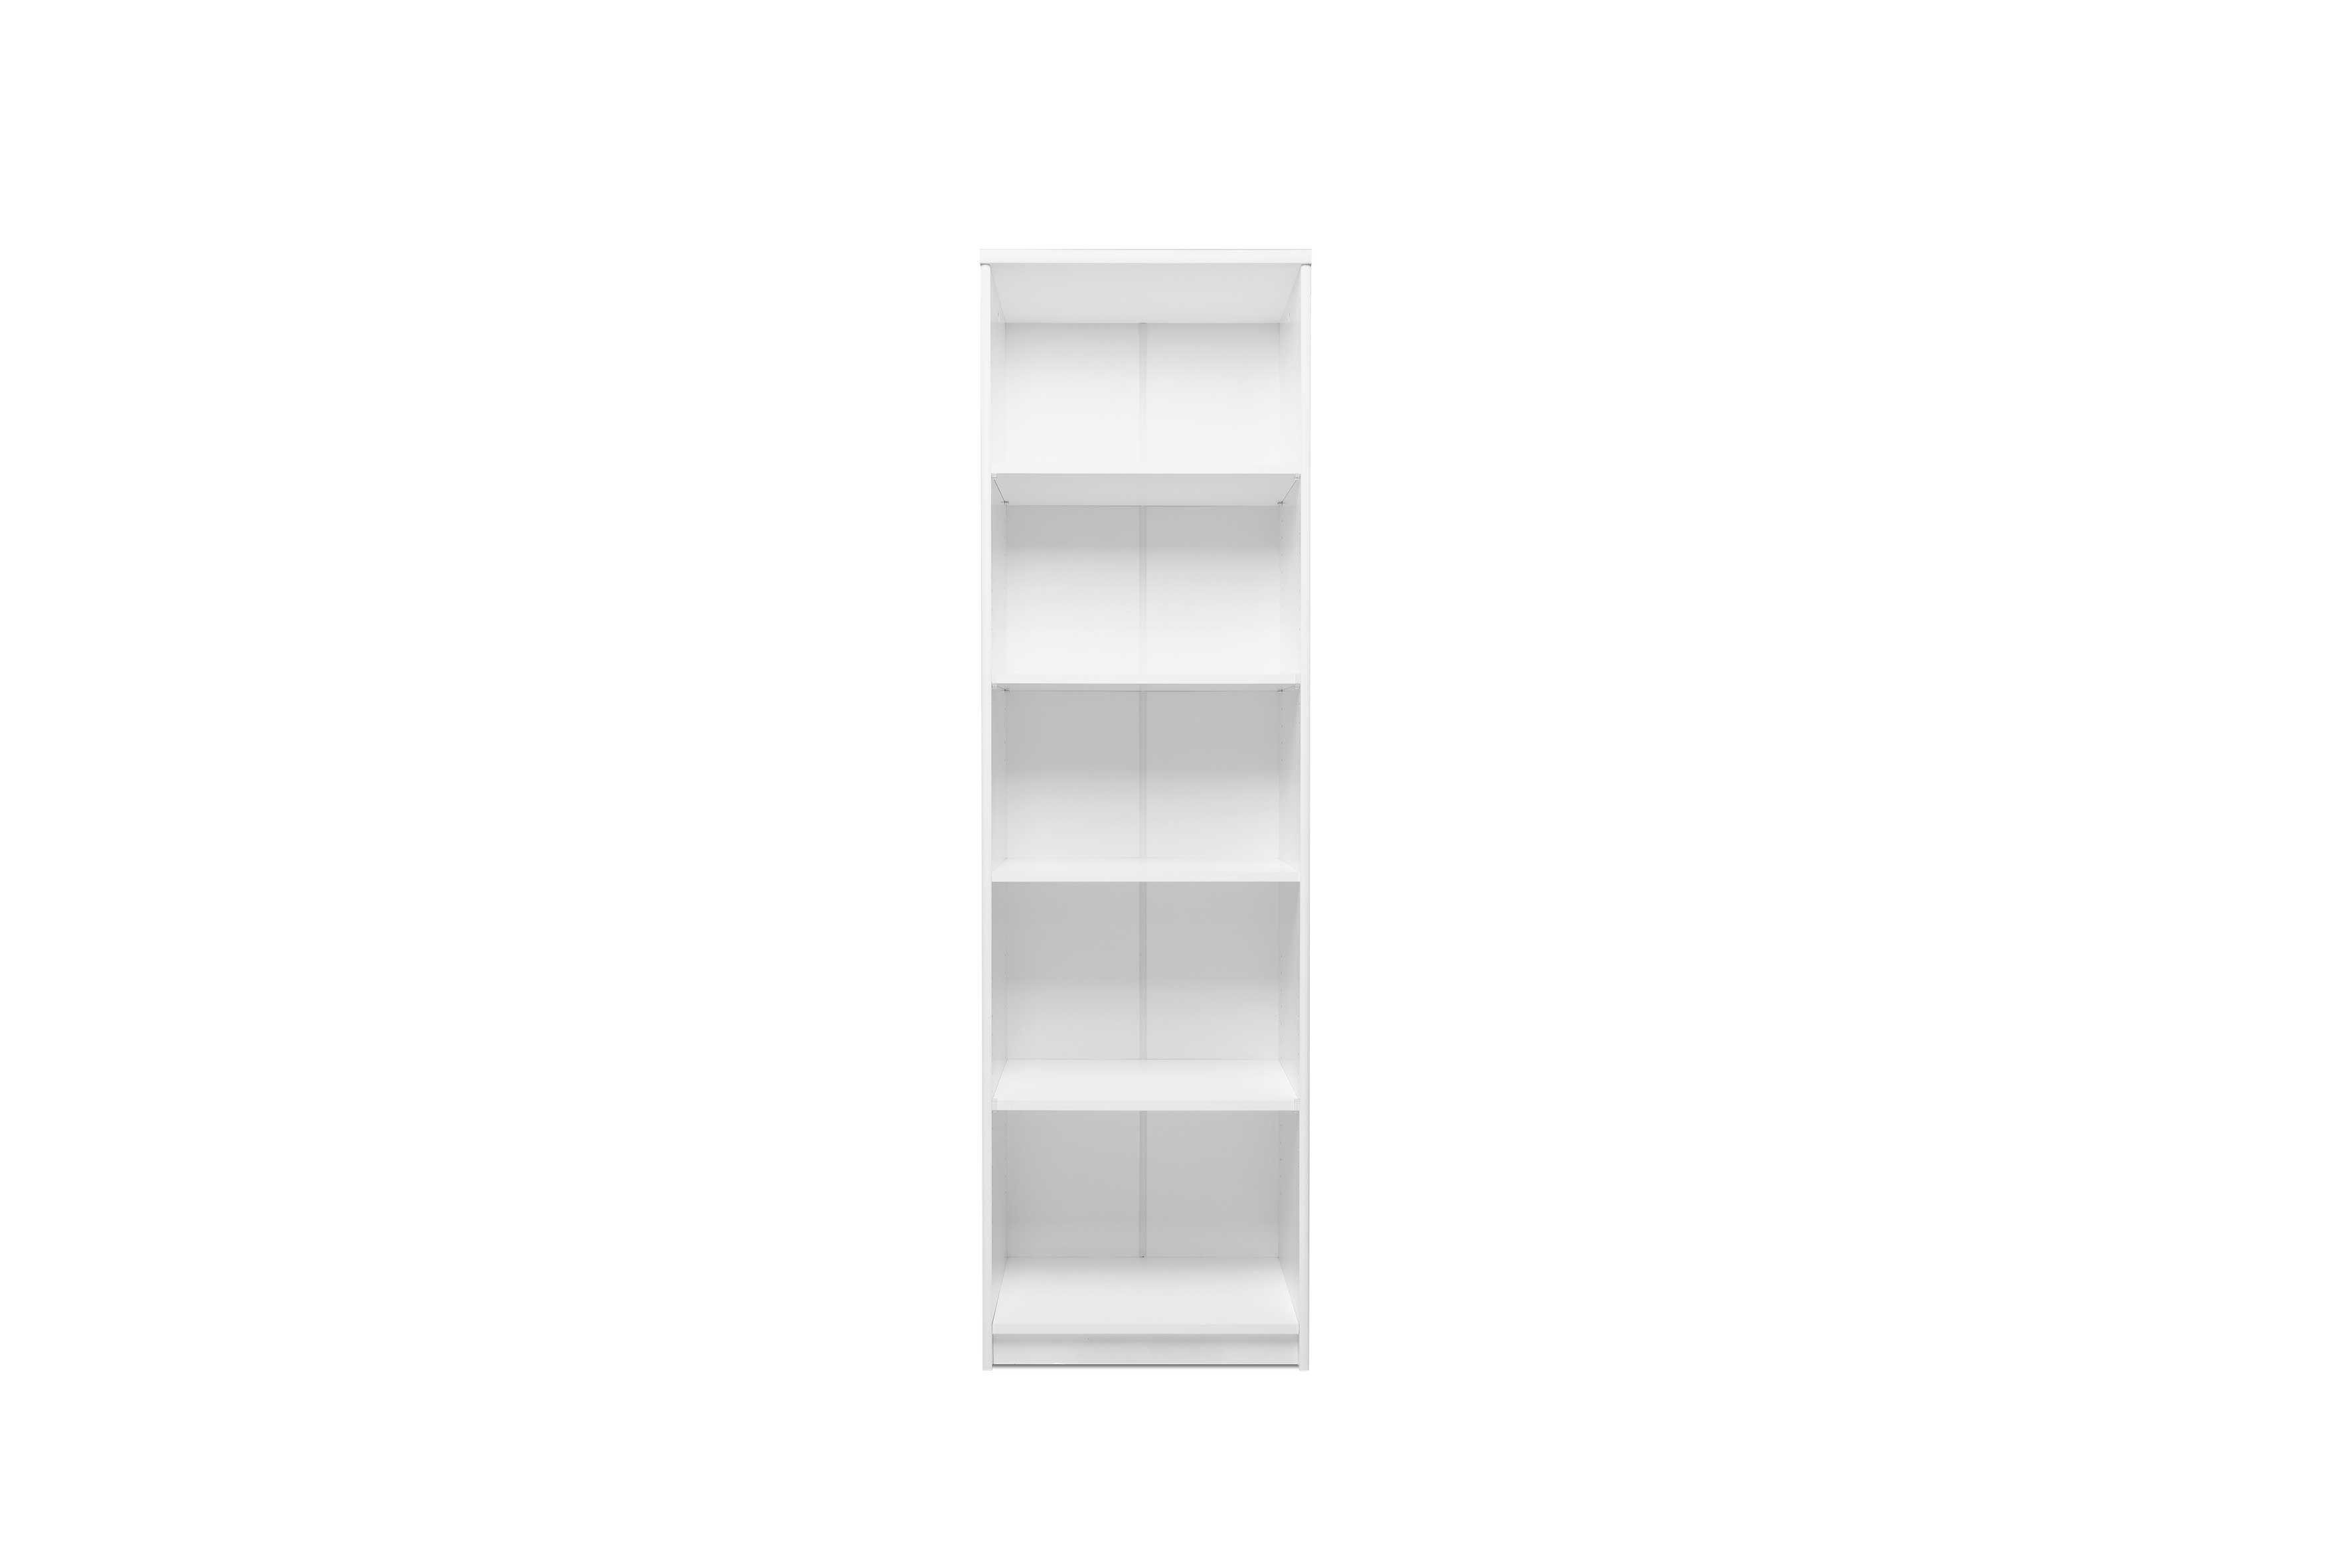 Regalbild 3 Regale & 1 Tür weiß Finori | Emob